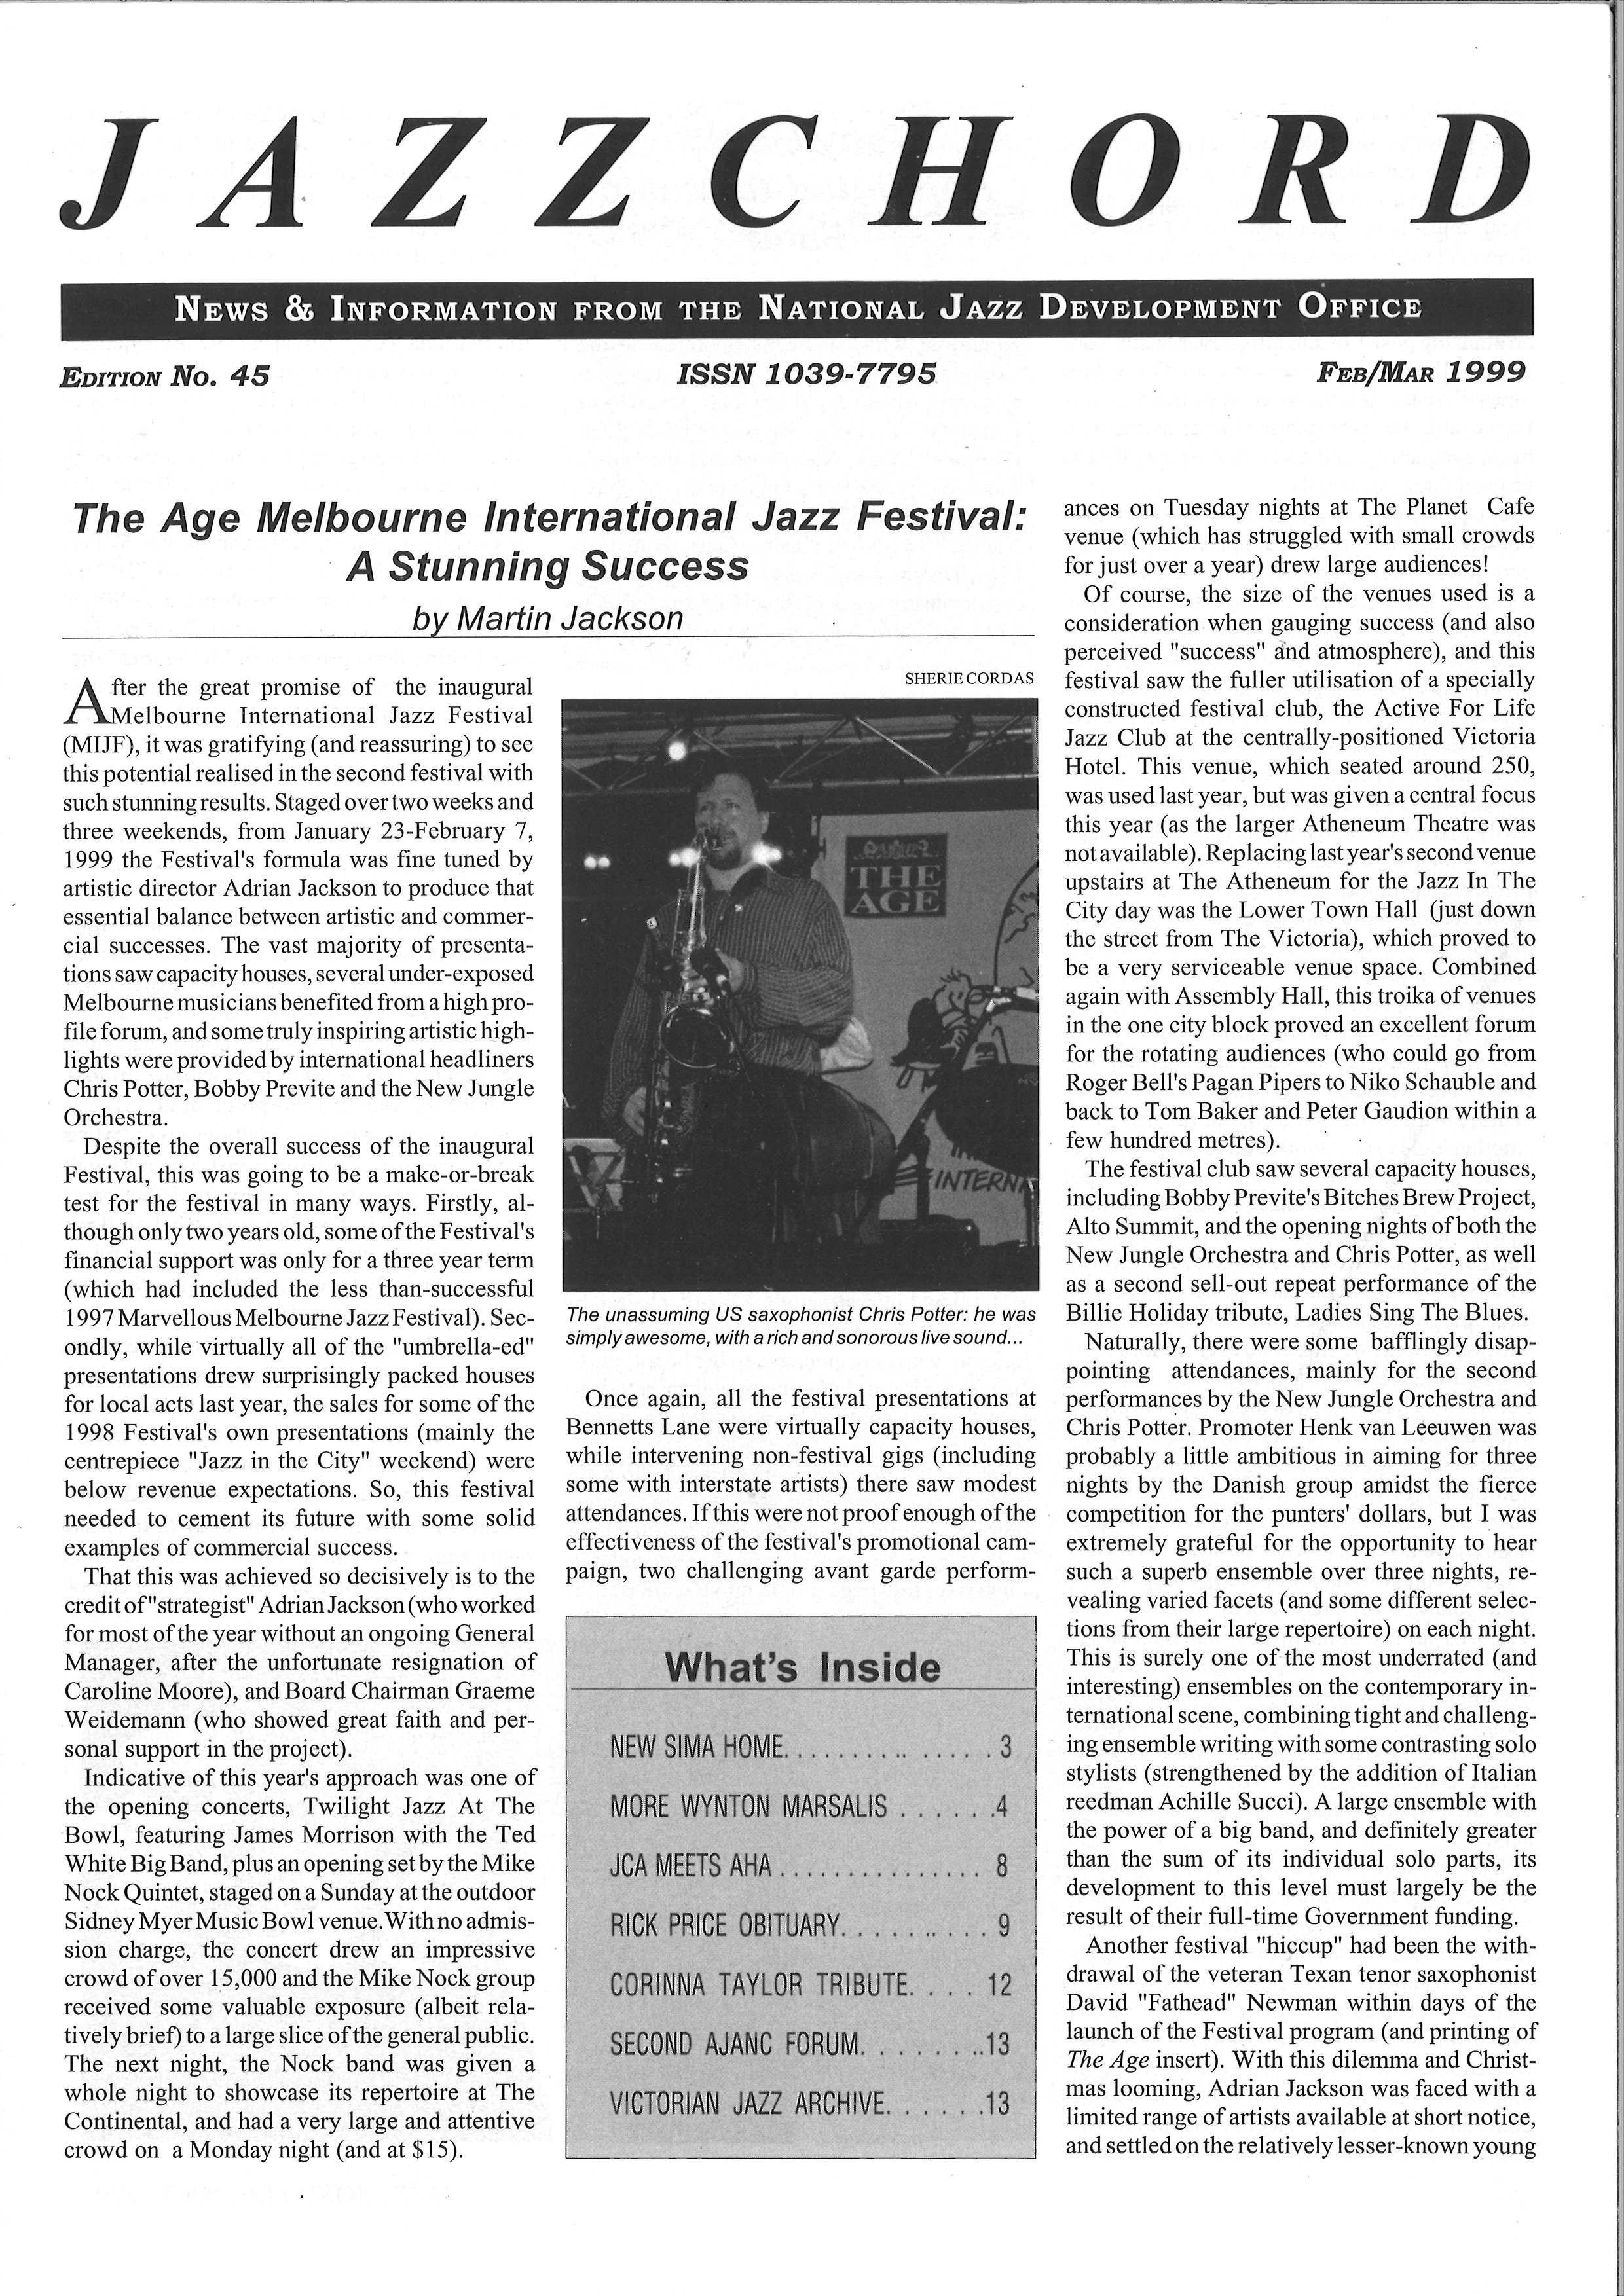 JazzChord45FebMar99FrontCover.jpg